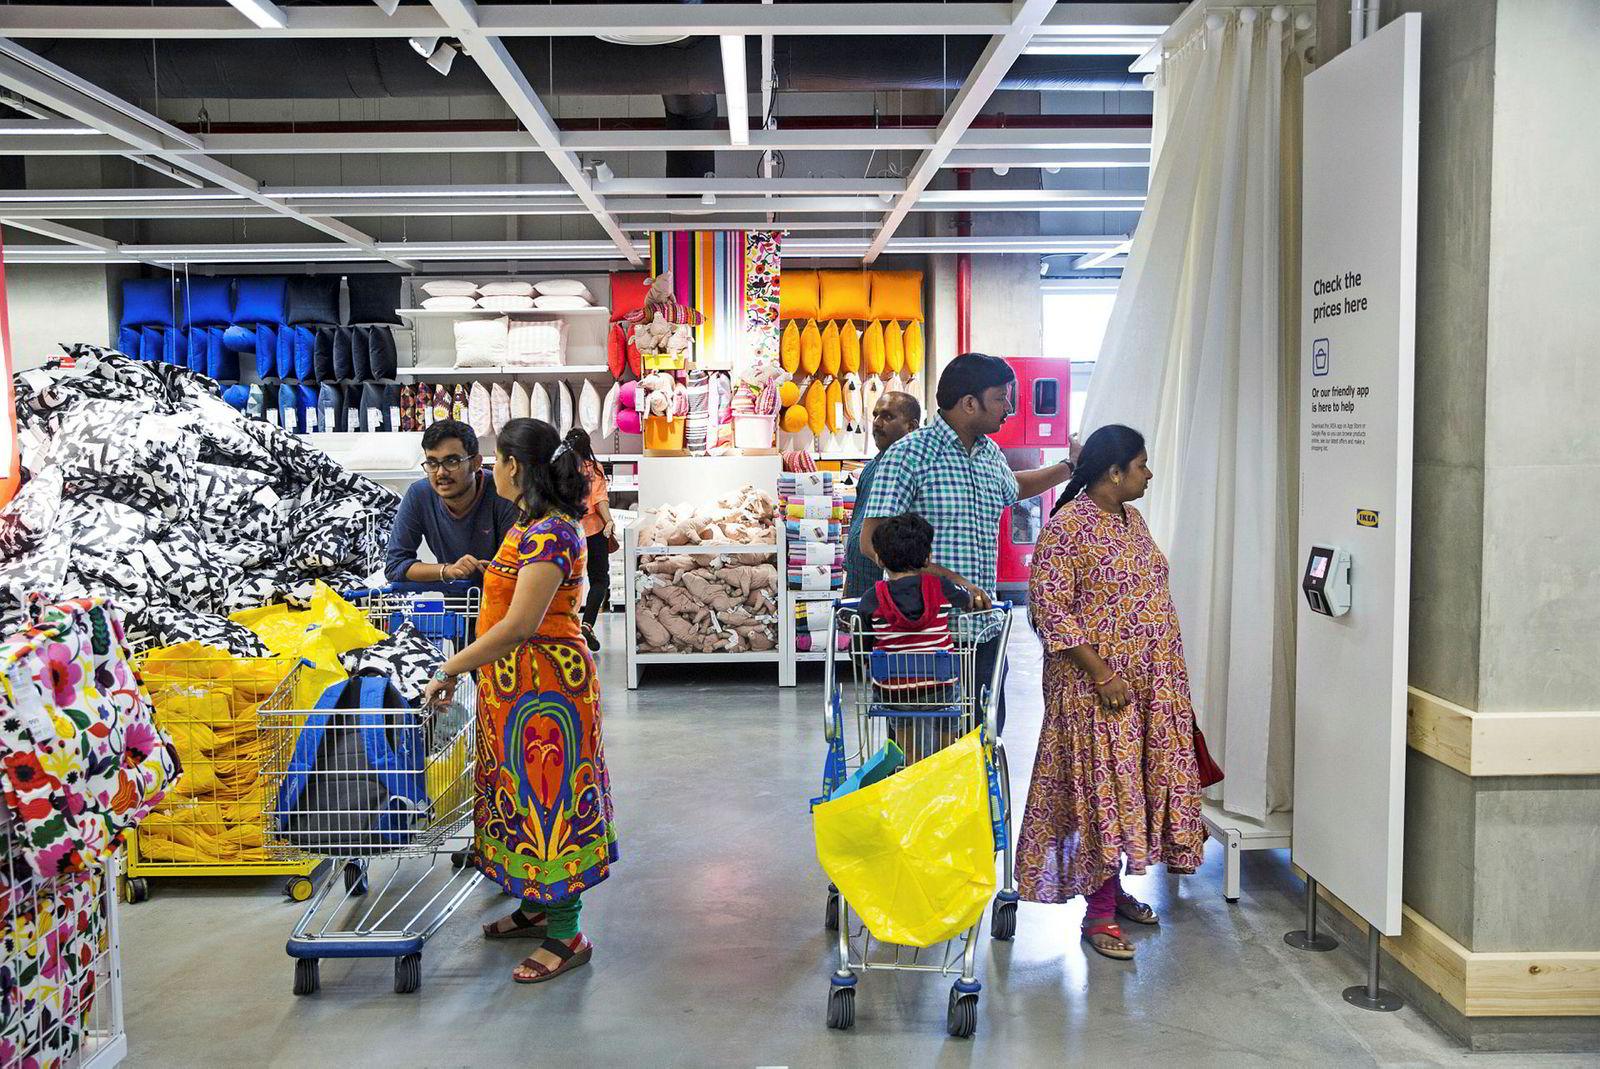 Kunder ved det nyåpnede utsalgsstedet til Ikea. Det nye varehuset går over 40.000 kvadratmeter.